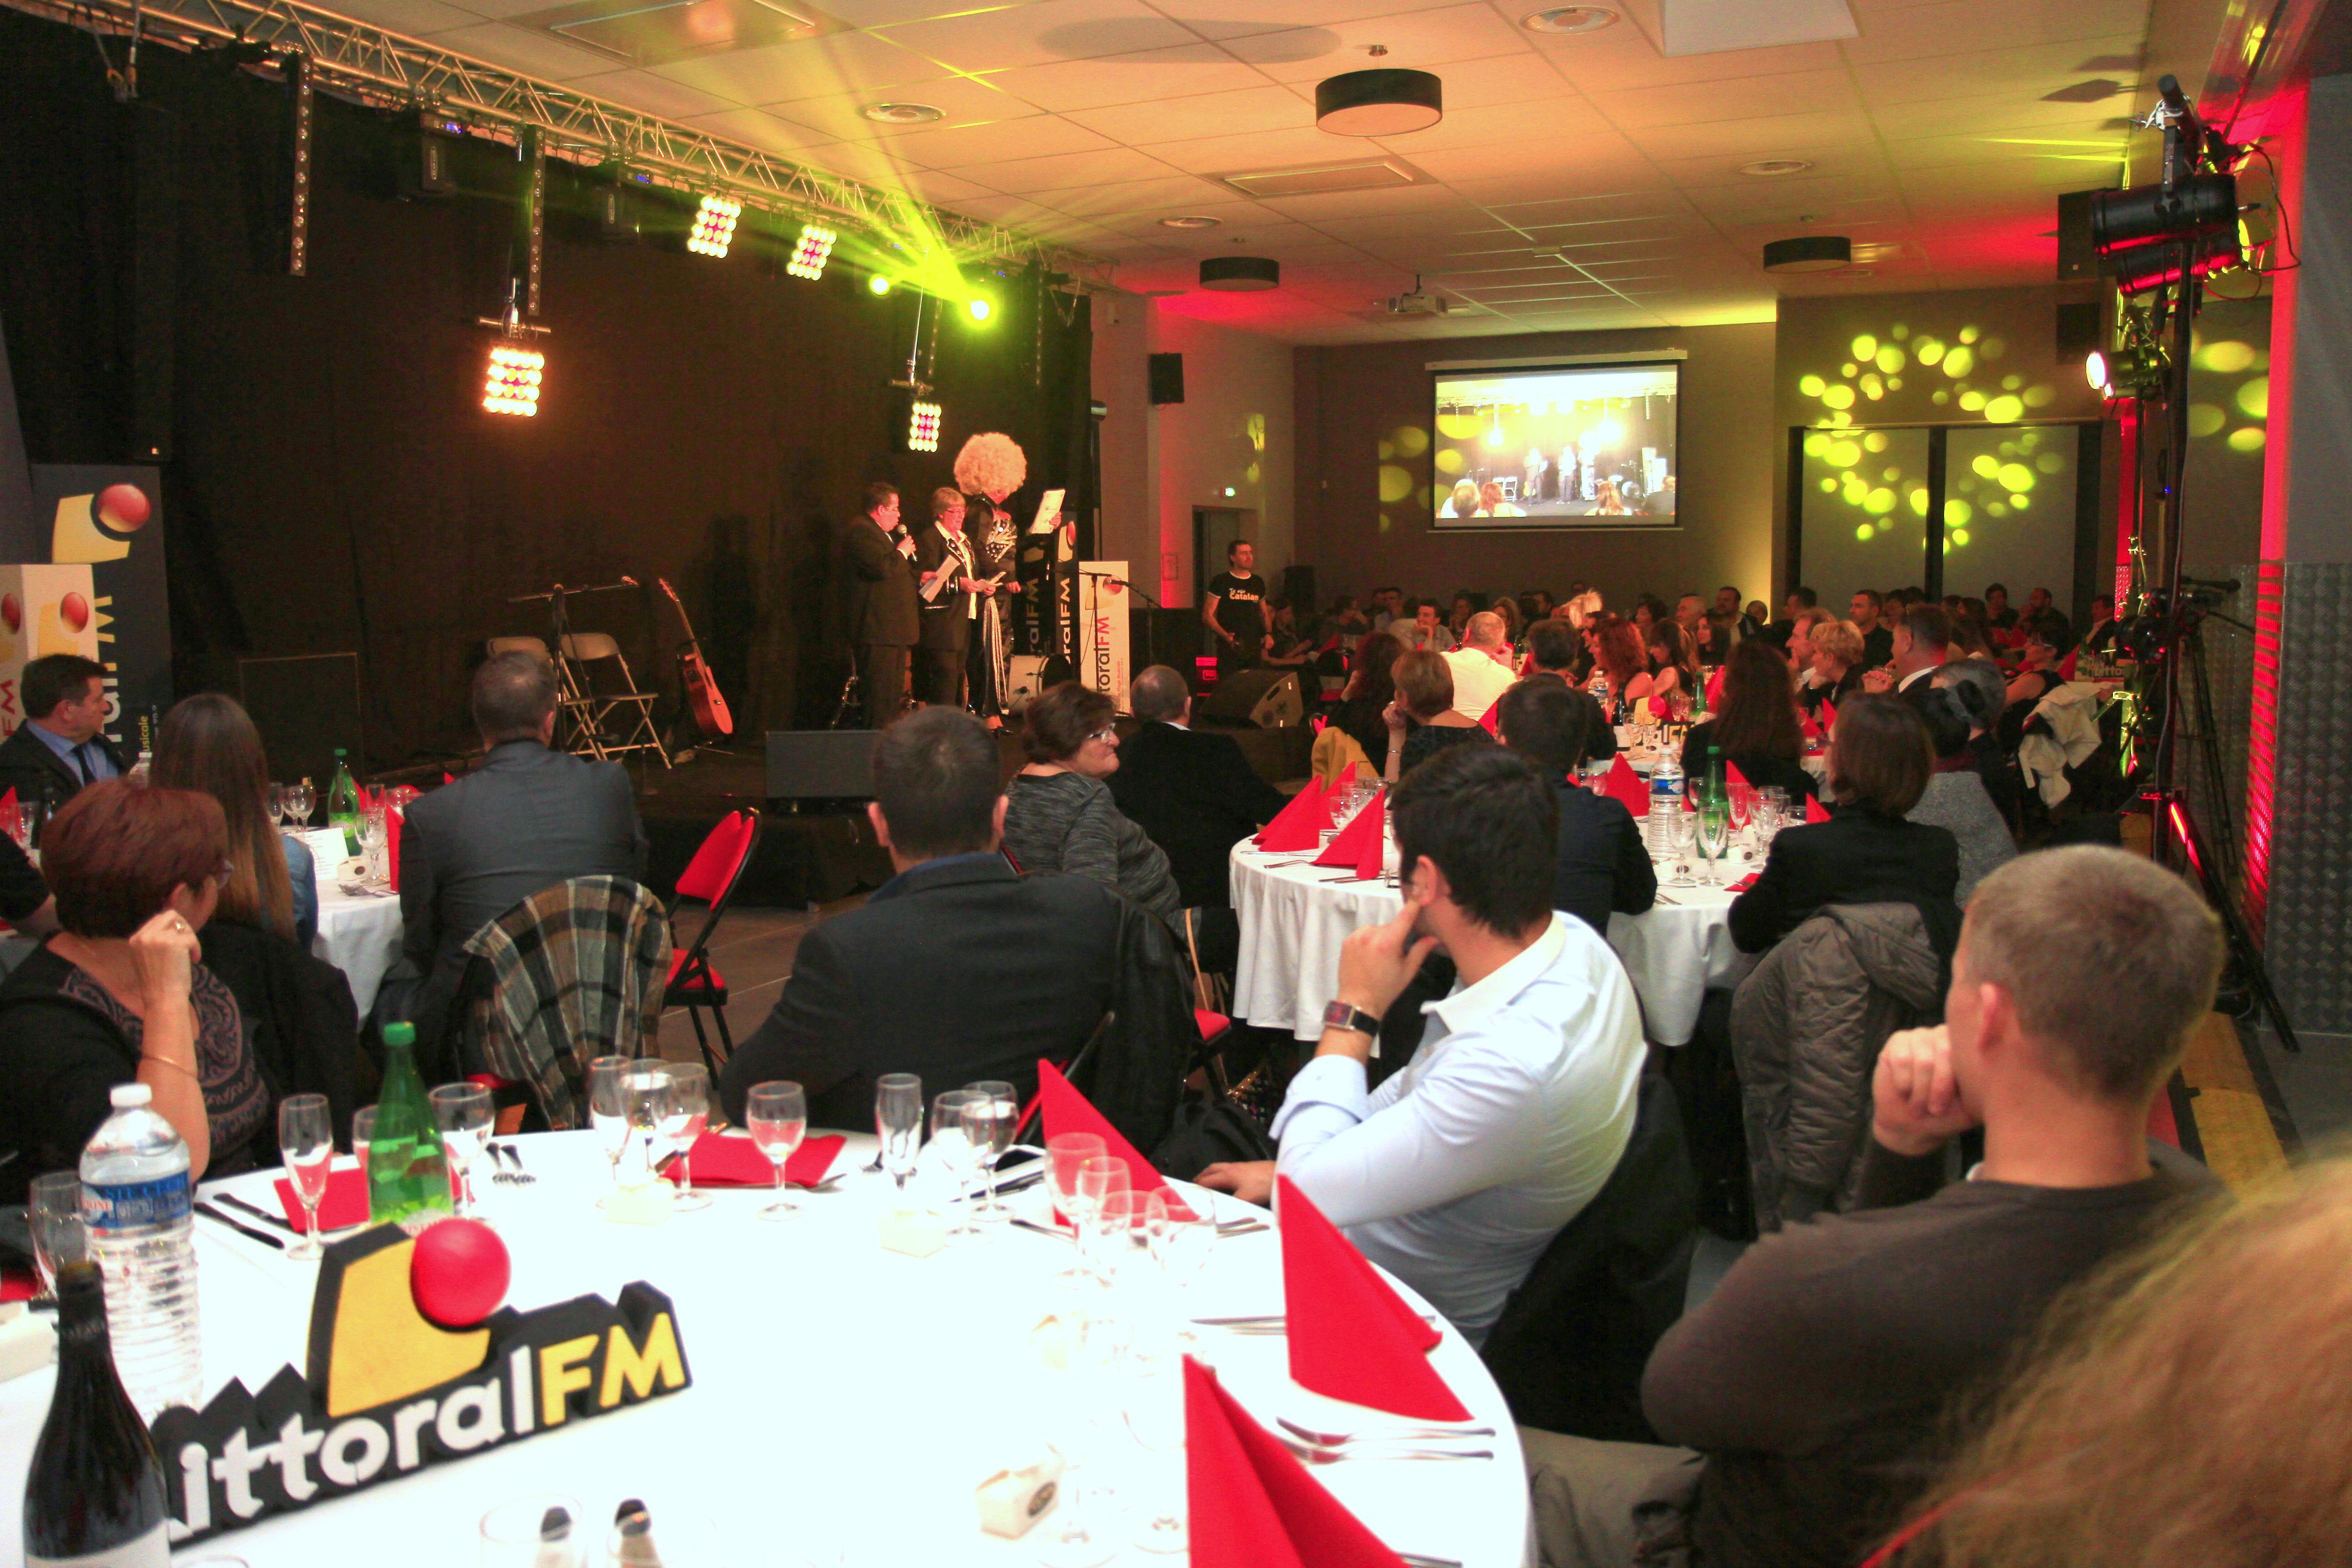 Littoral FM célèbre Noël avant l'heure